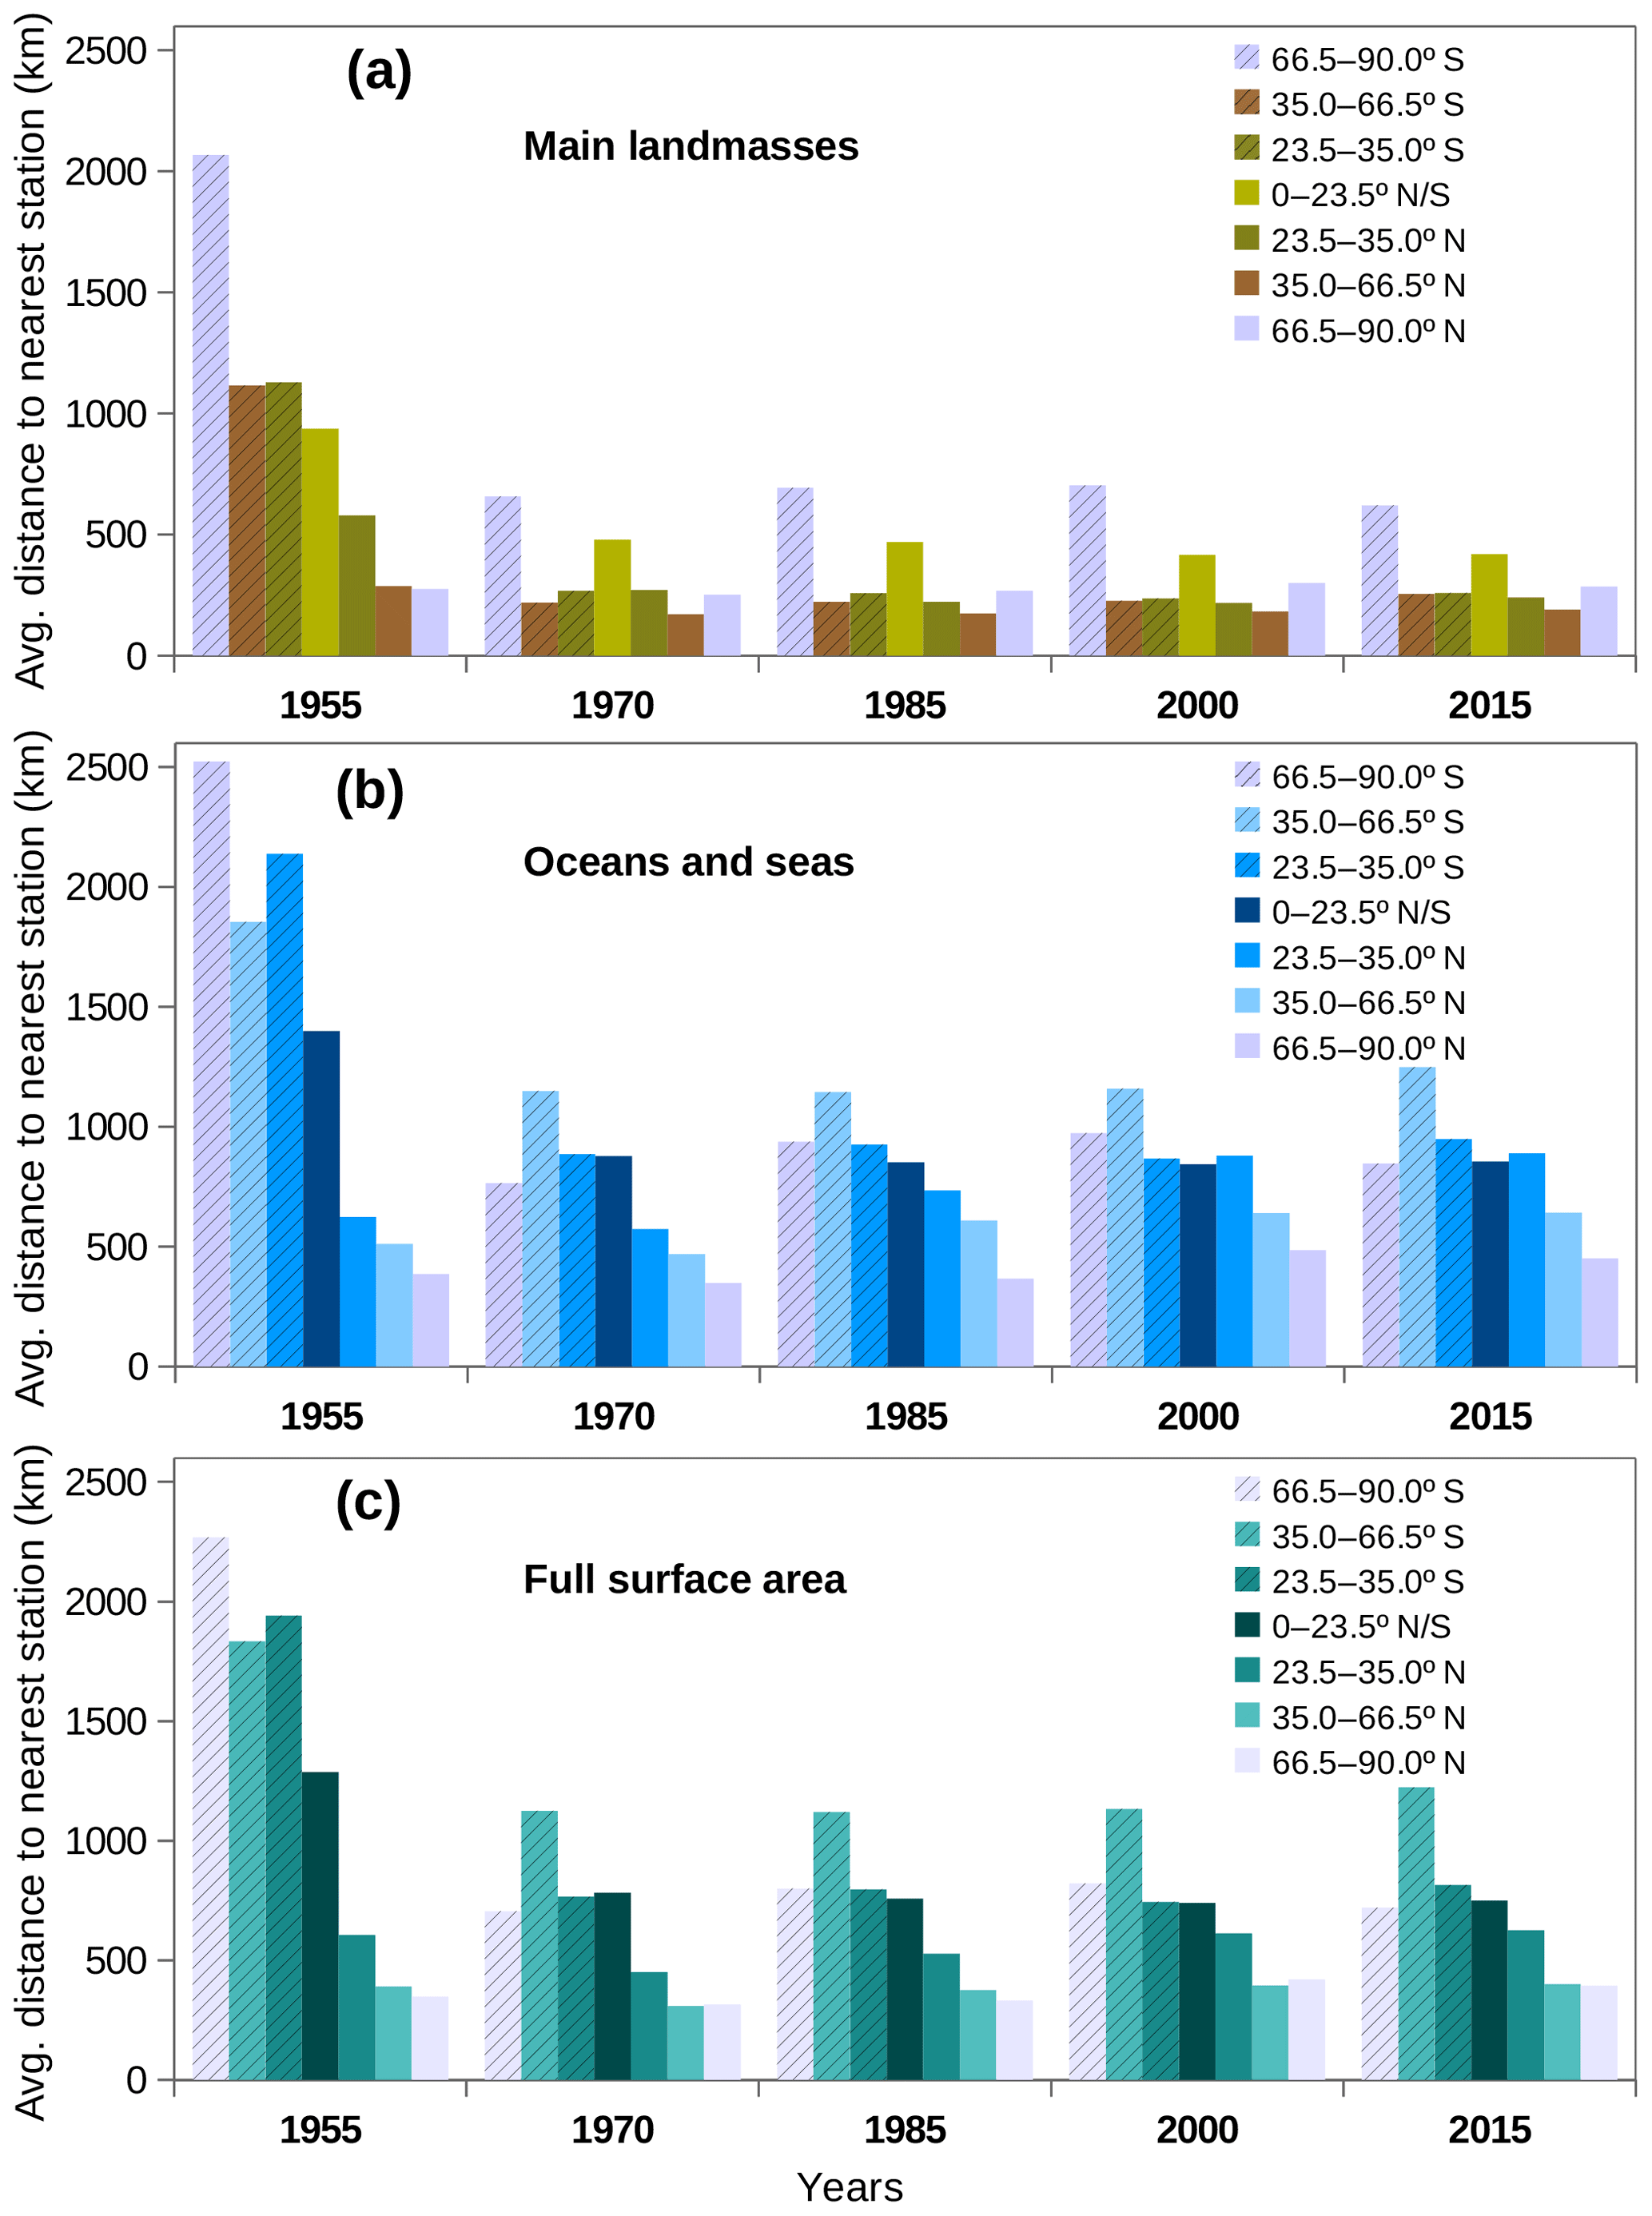 ESSD - Completeness of radiosonde humidity observations based on the